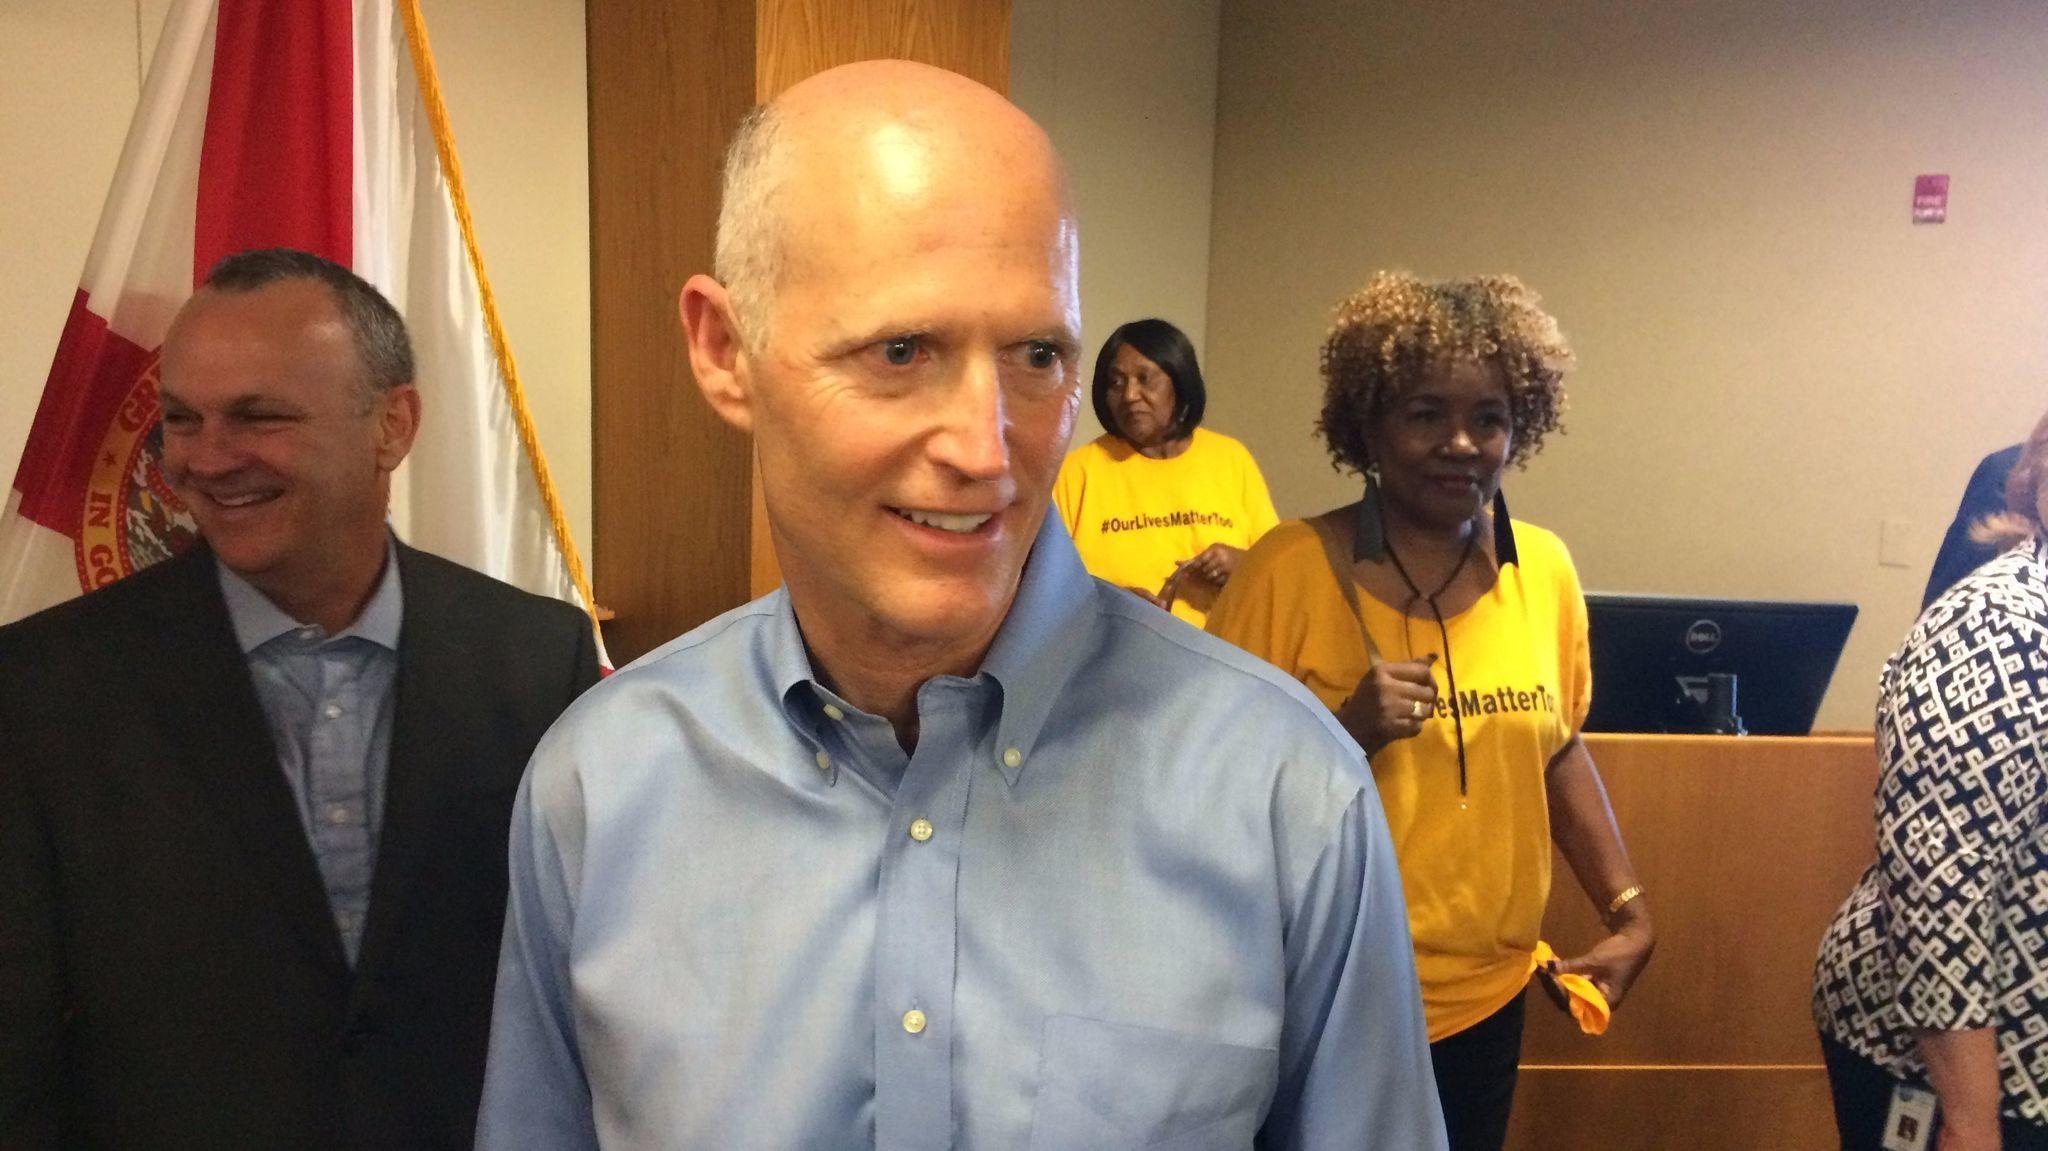 Scott Touts New Budget Agreement In West Palm Beach Sun Sentinel